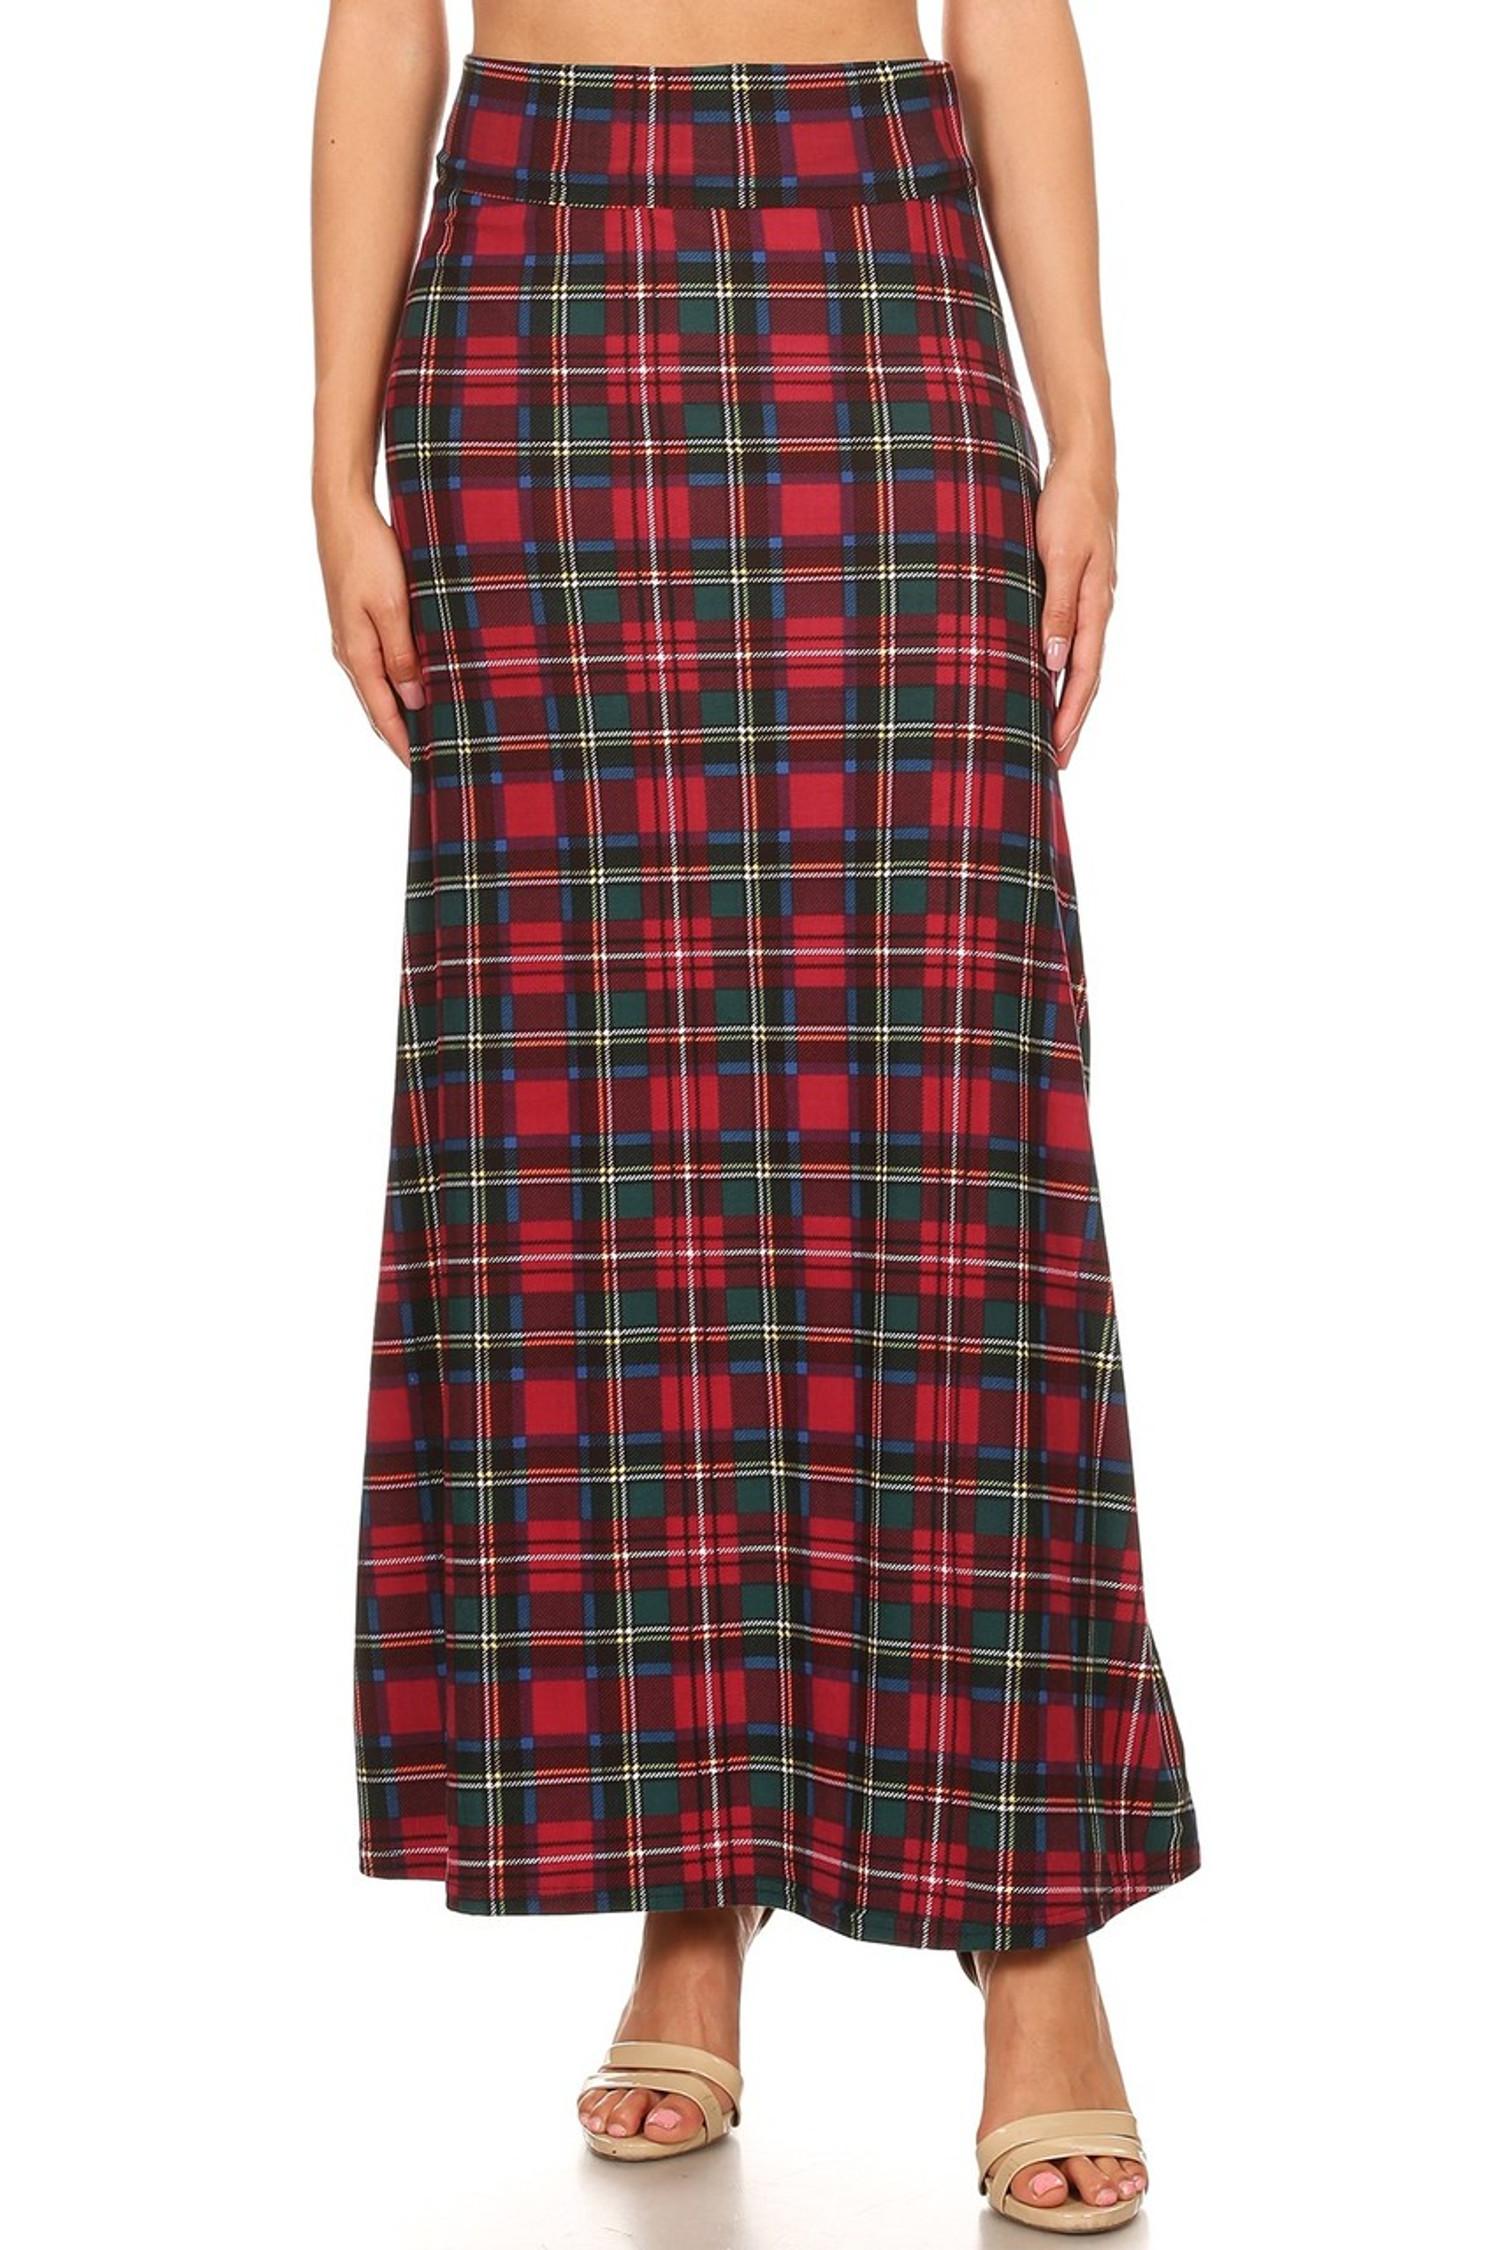 Modish Plaid Maxi Skirt